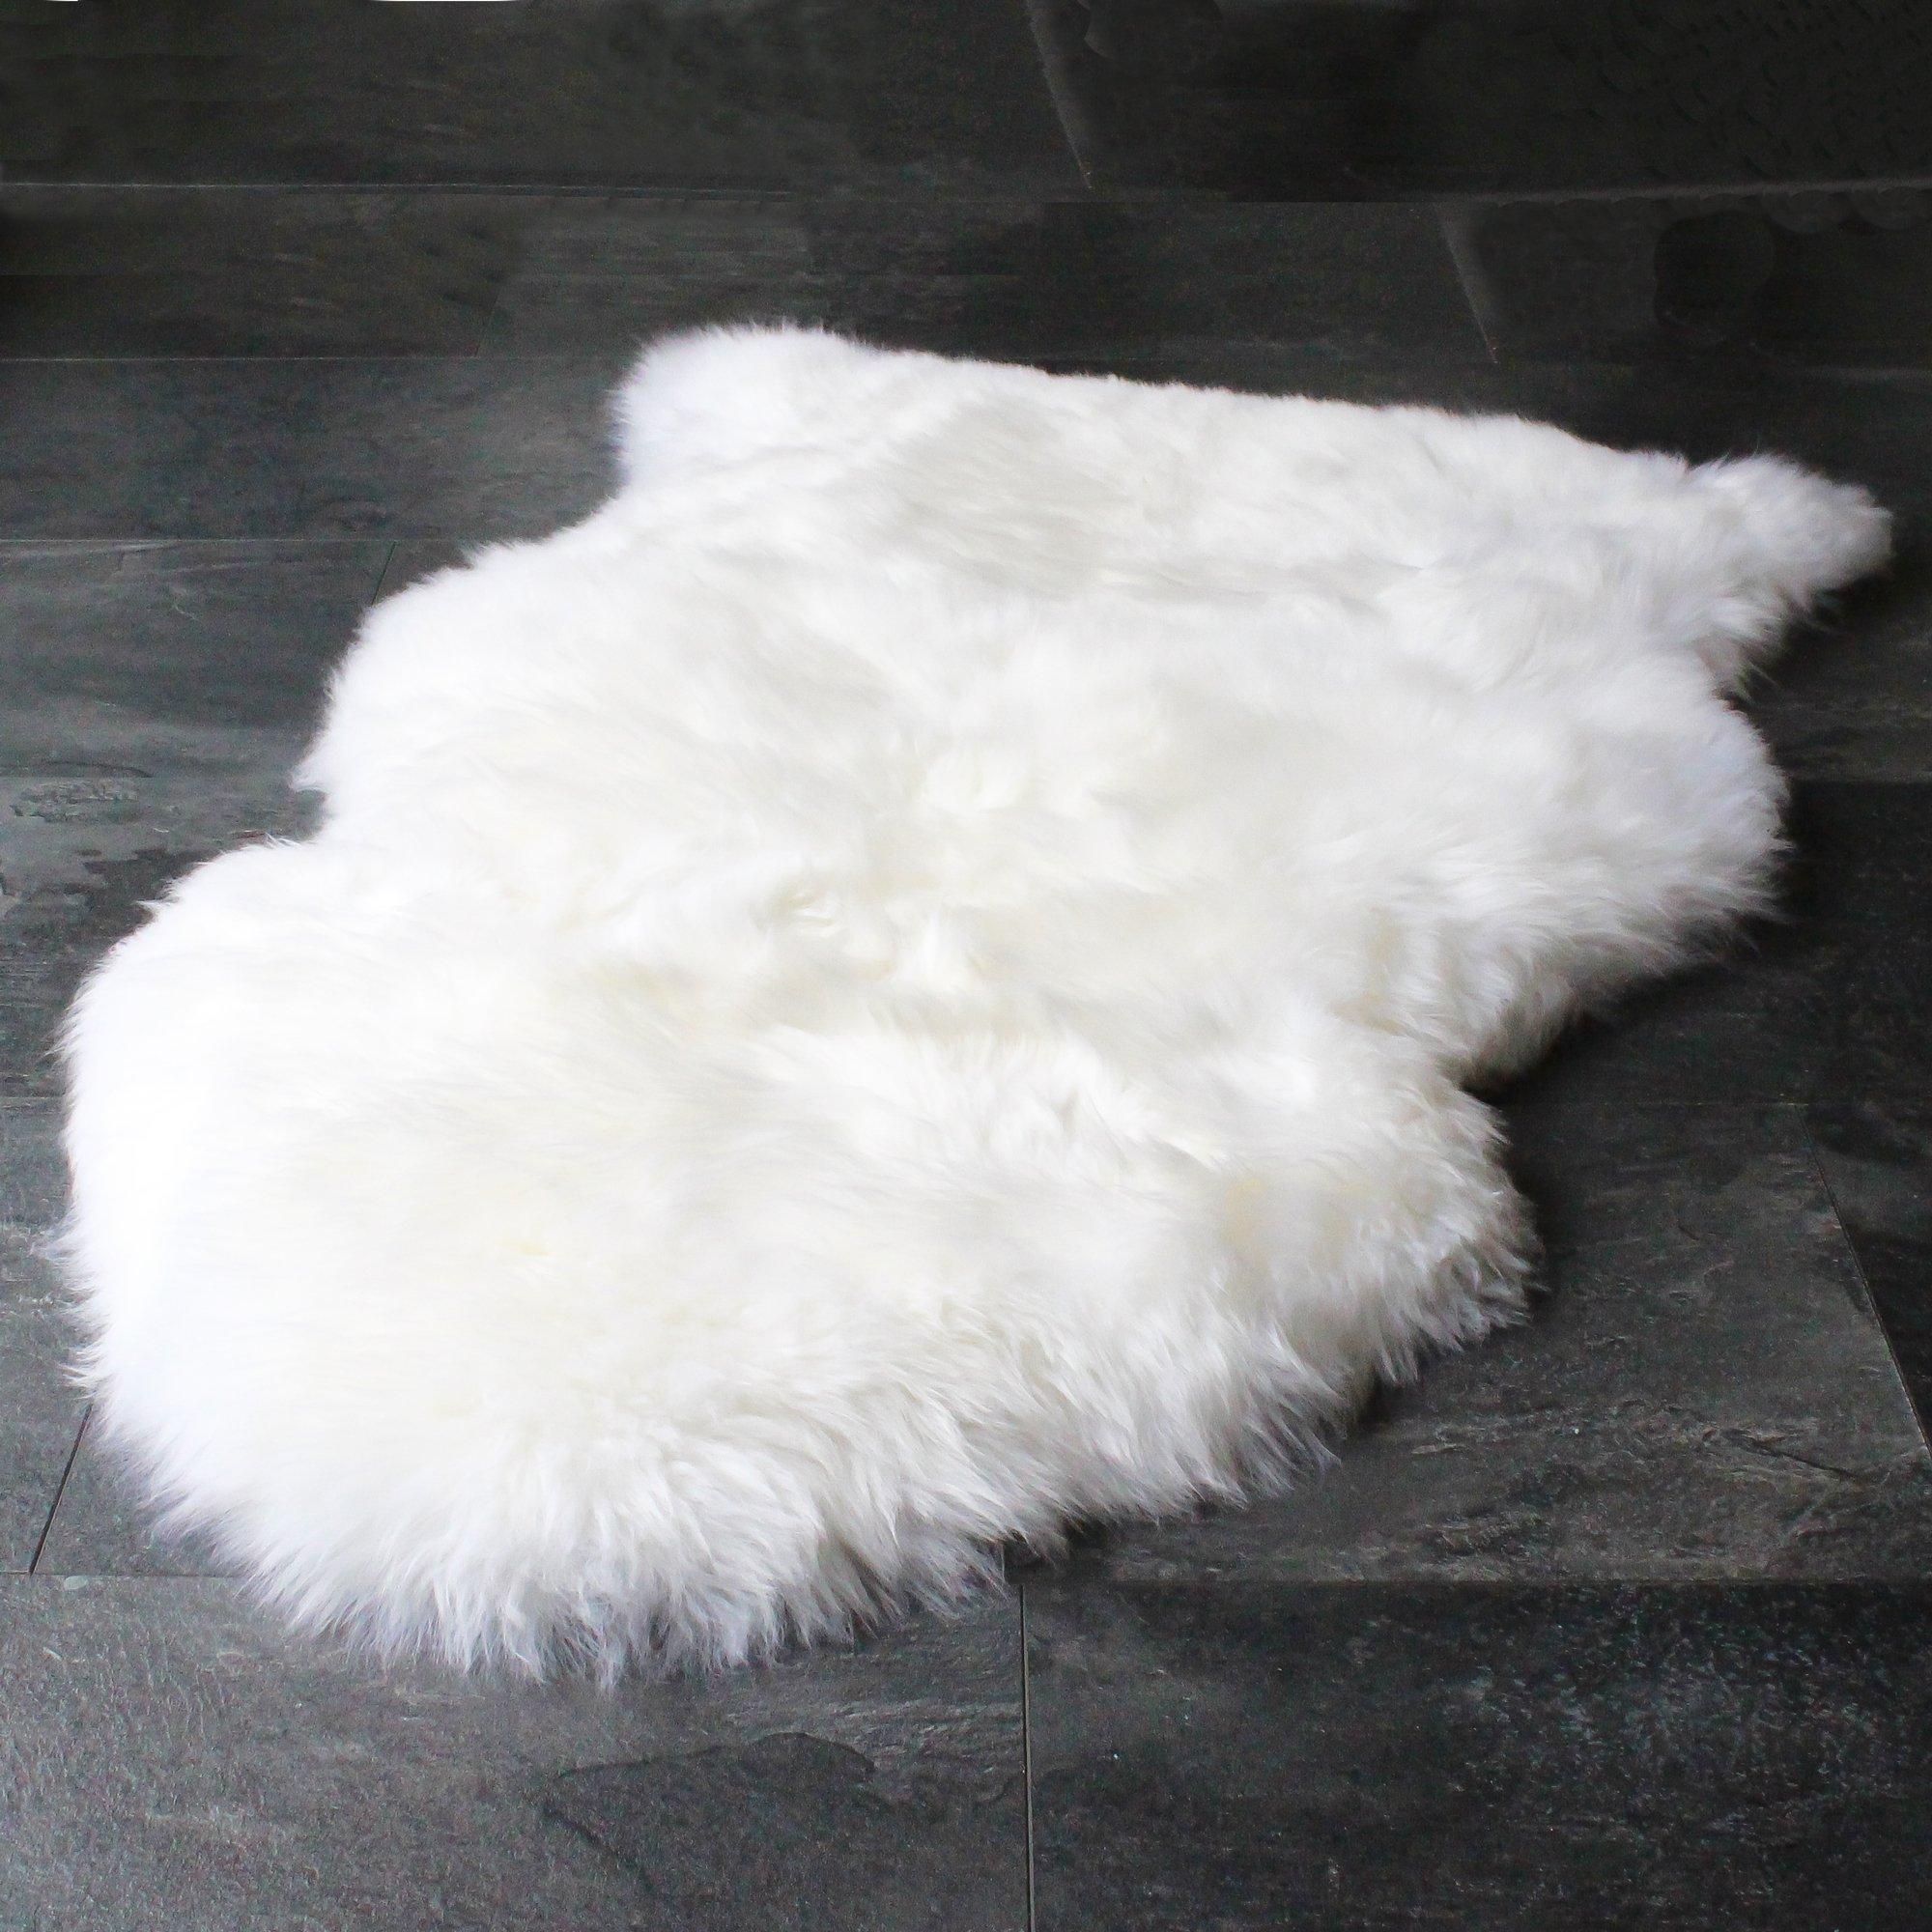 Sheepskin Rug Cleaners: Sheepskin Rug Genuine Soft Natural Merino + Care Cleaning